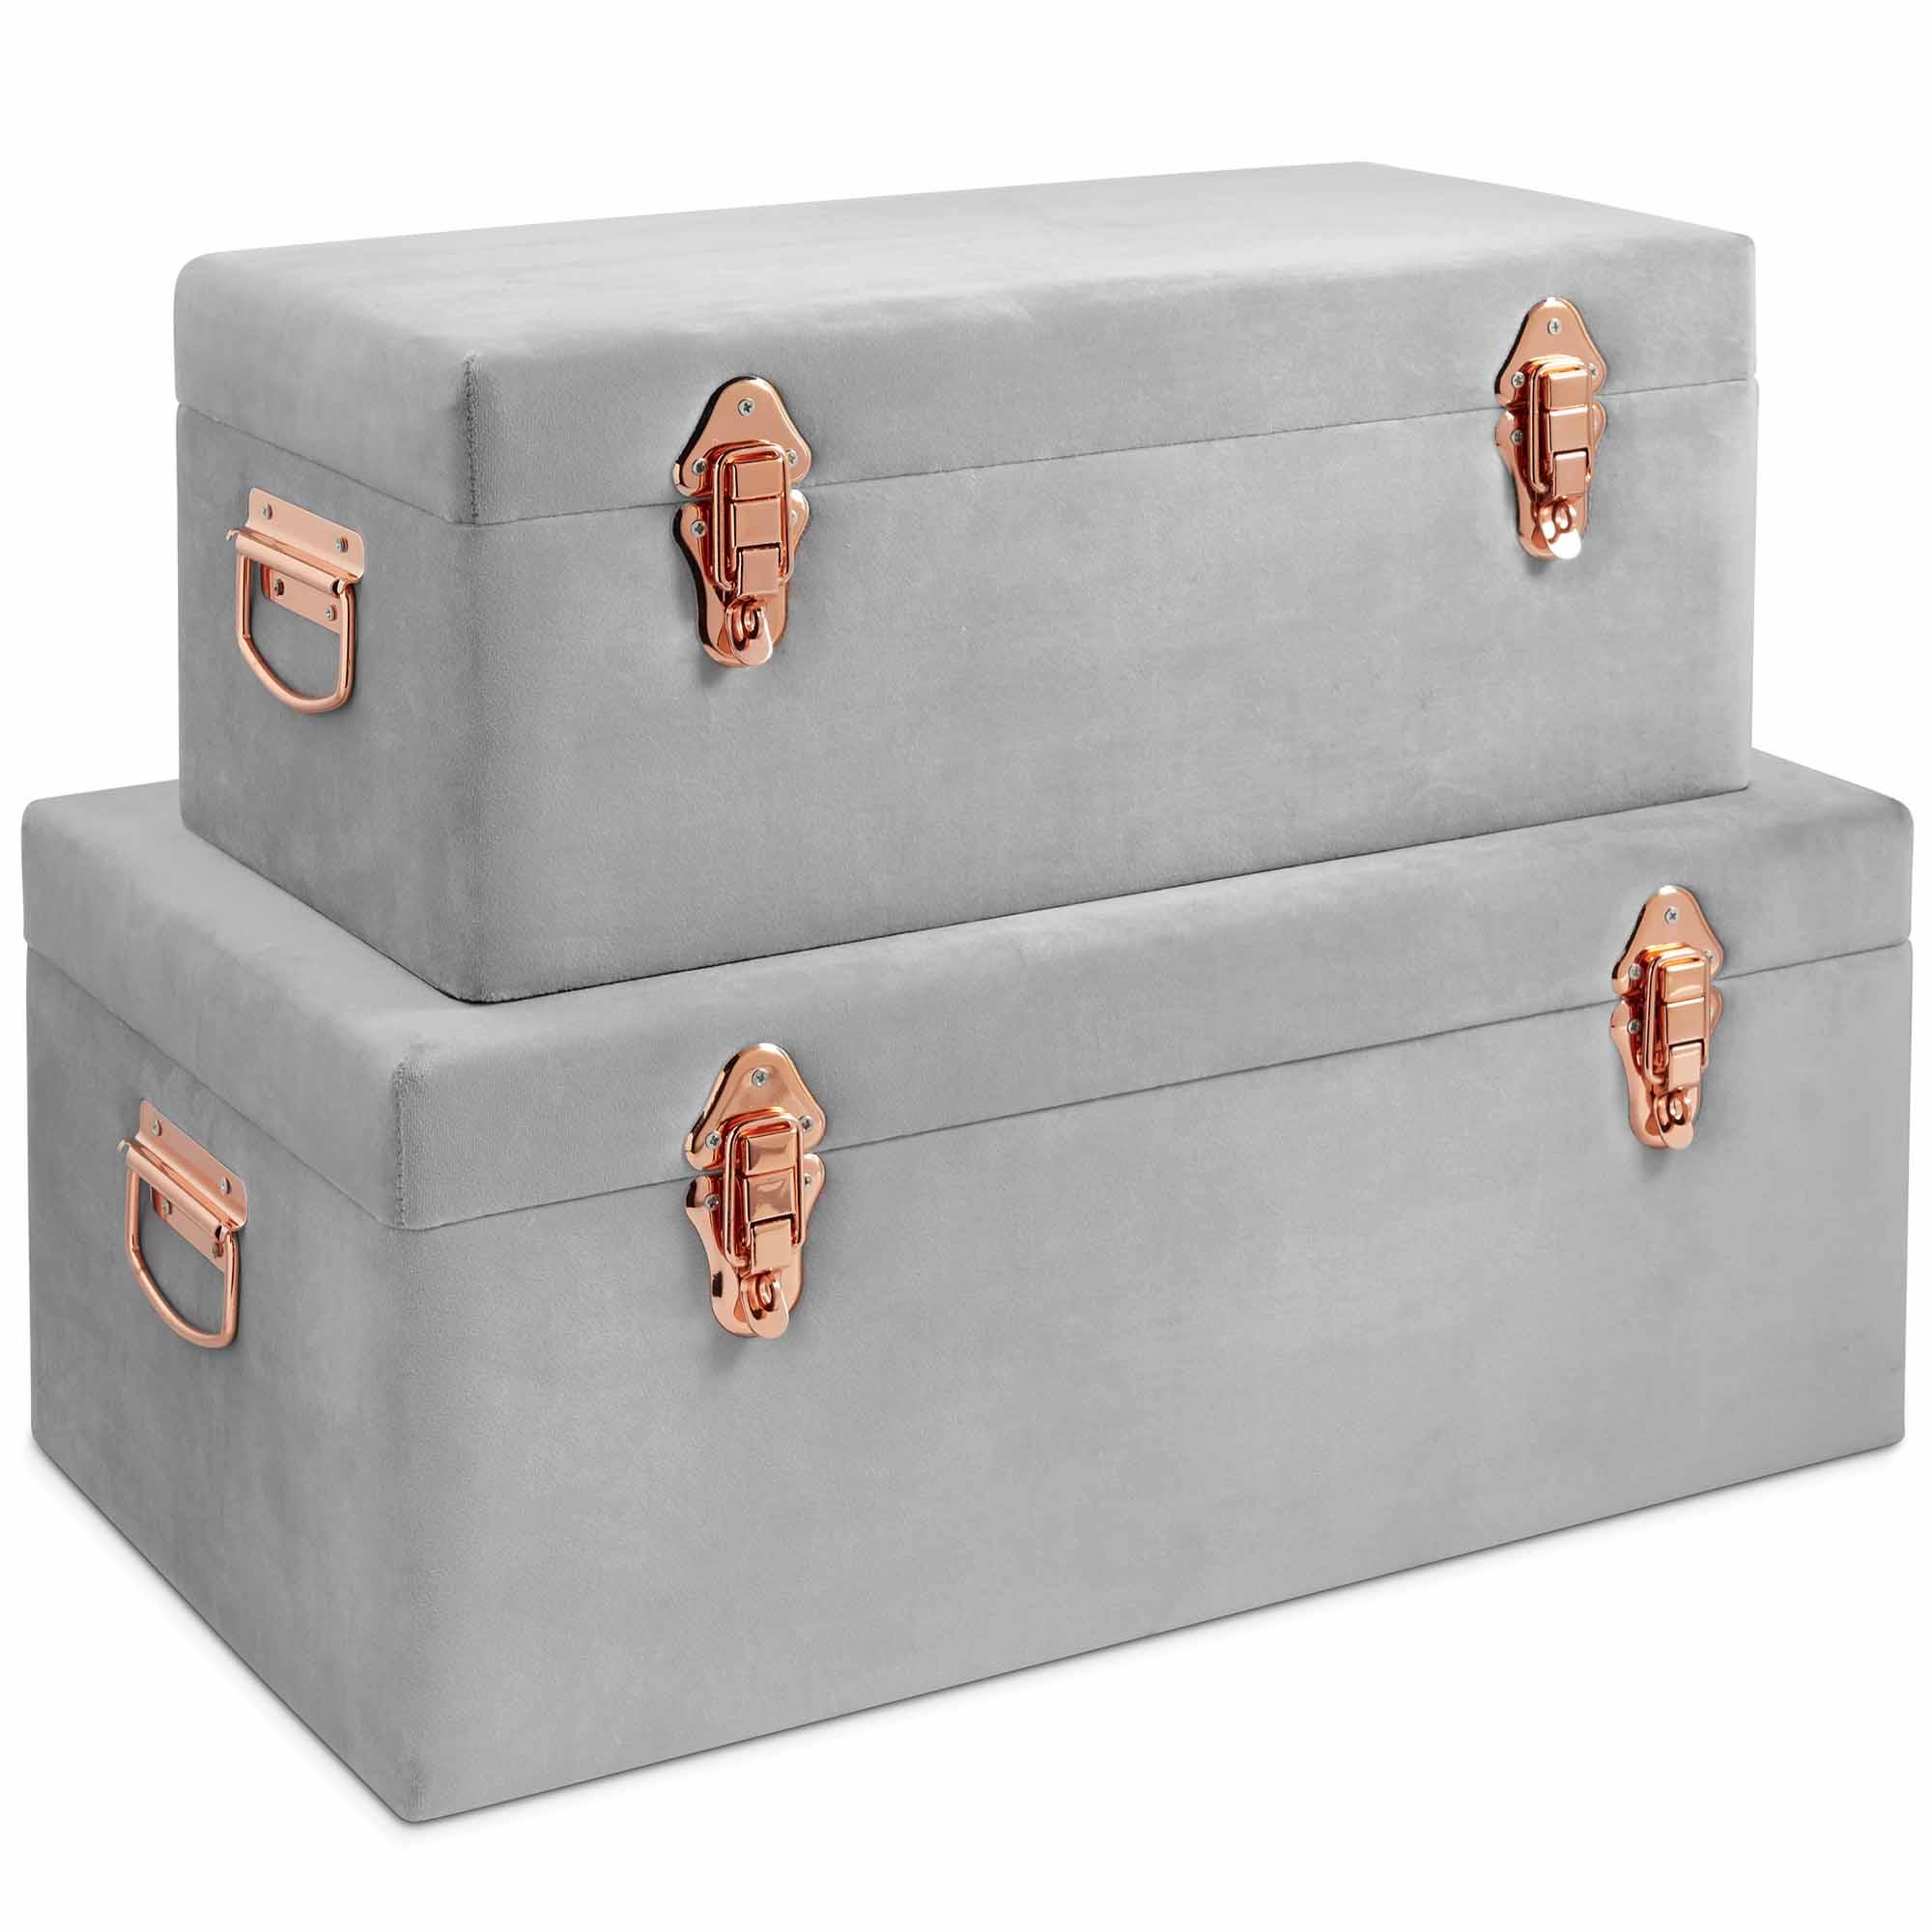 beautify storage trunks set of 2 chests grey velvet rose